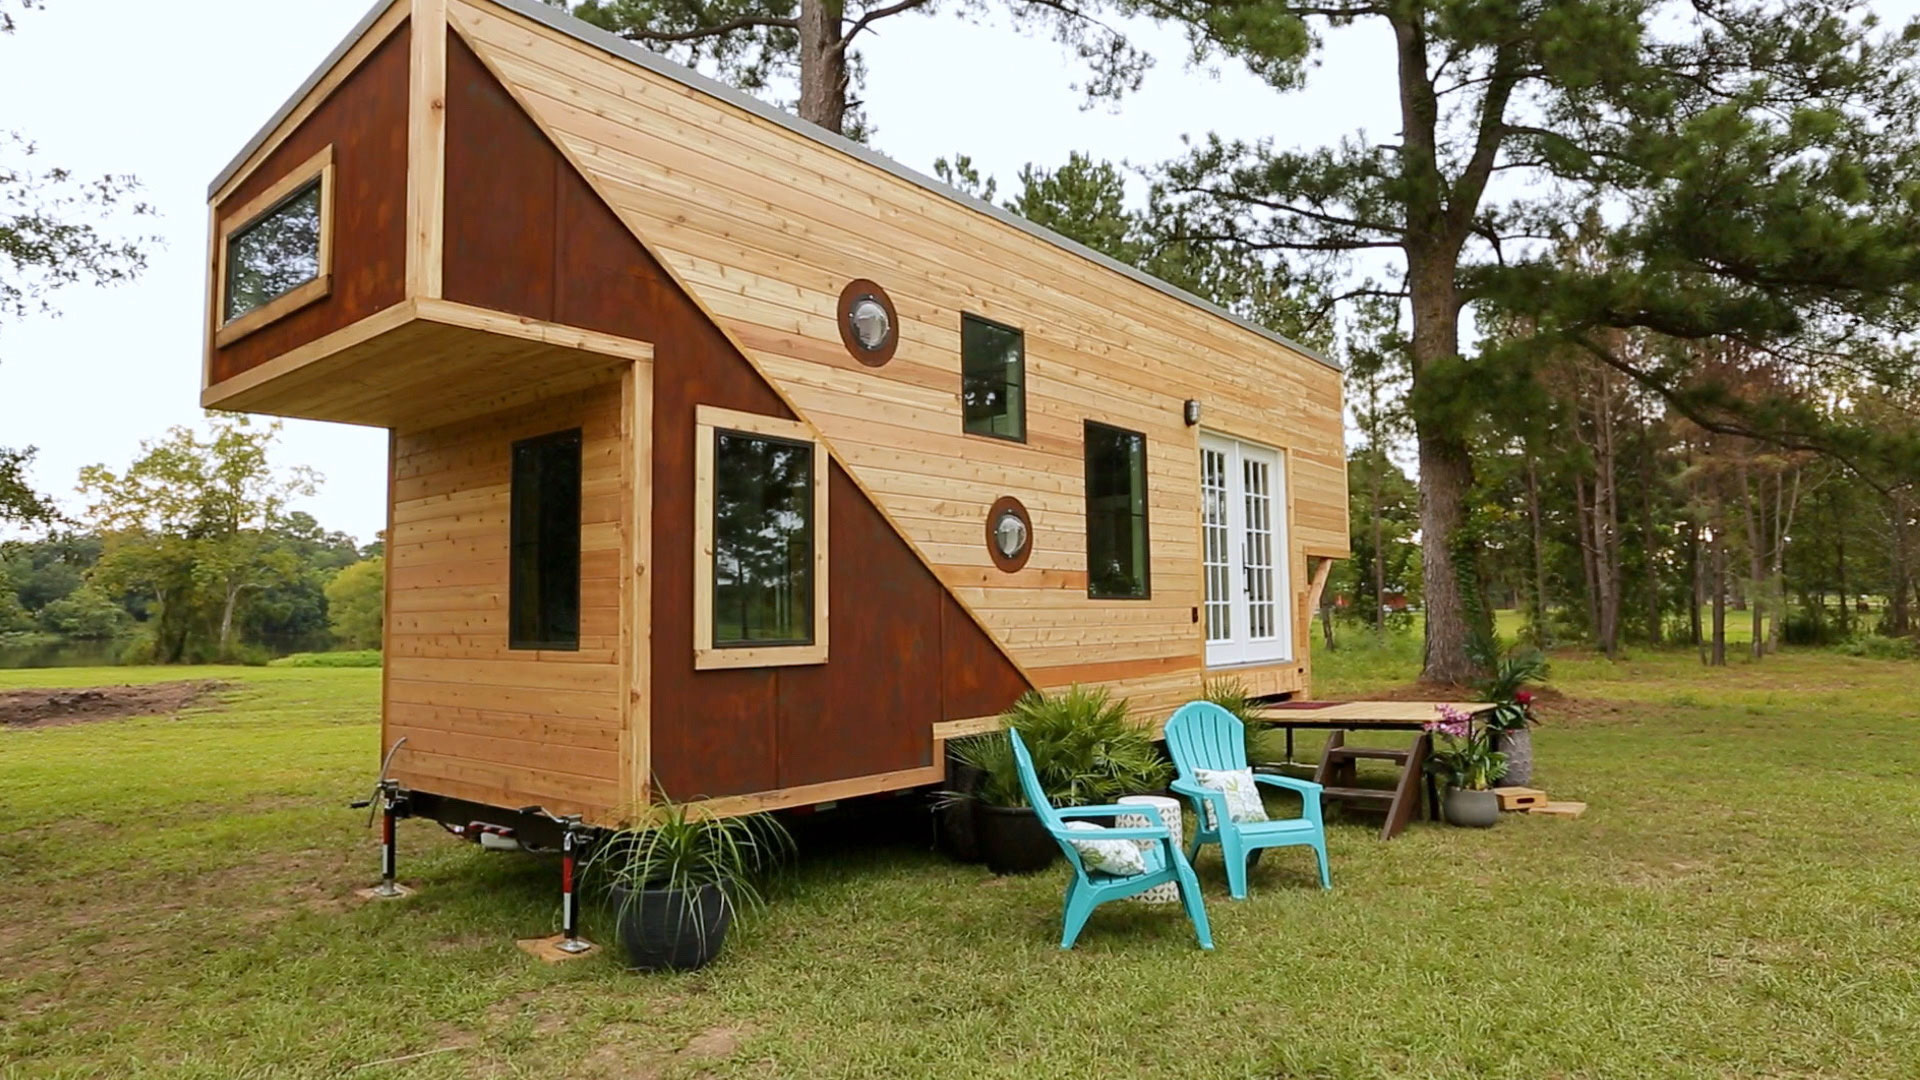 325 Sq. Ft. Texan's Take Tiny House